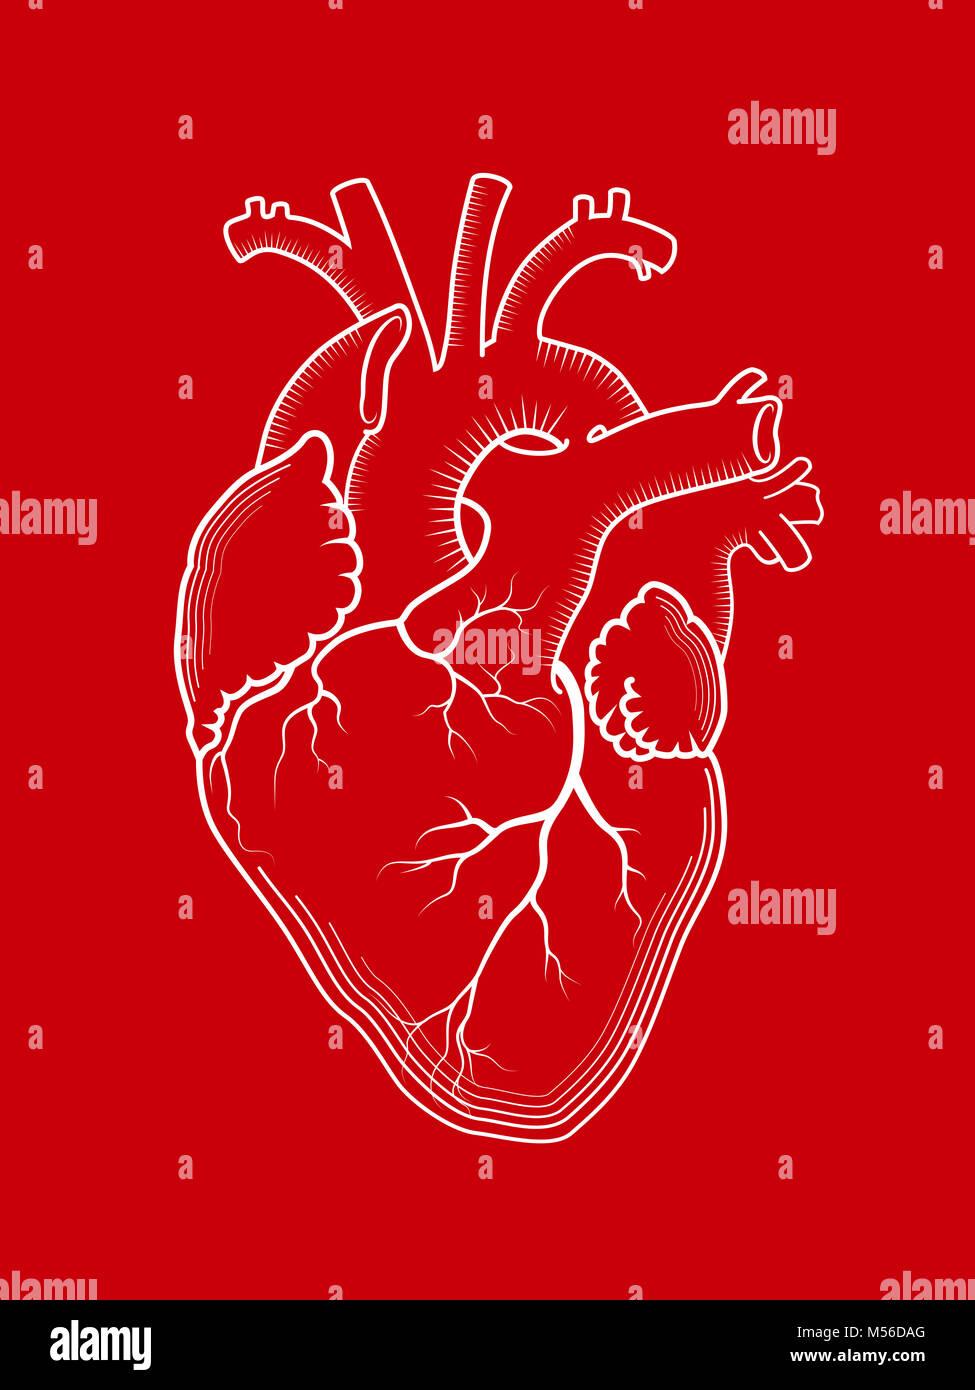 Heart the internal human organ anatomical structure stock photo heart the internal human organ anatomical structure ccuart Gallery